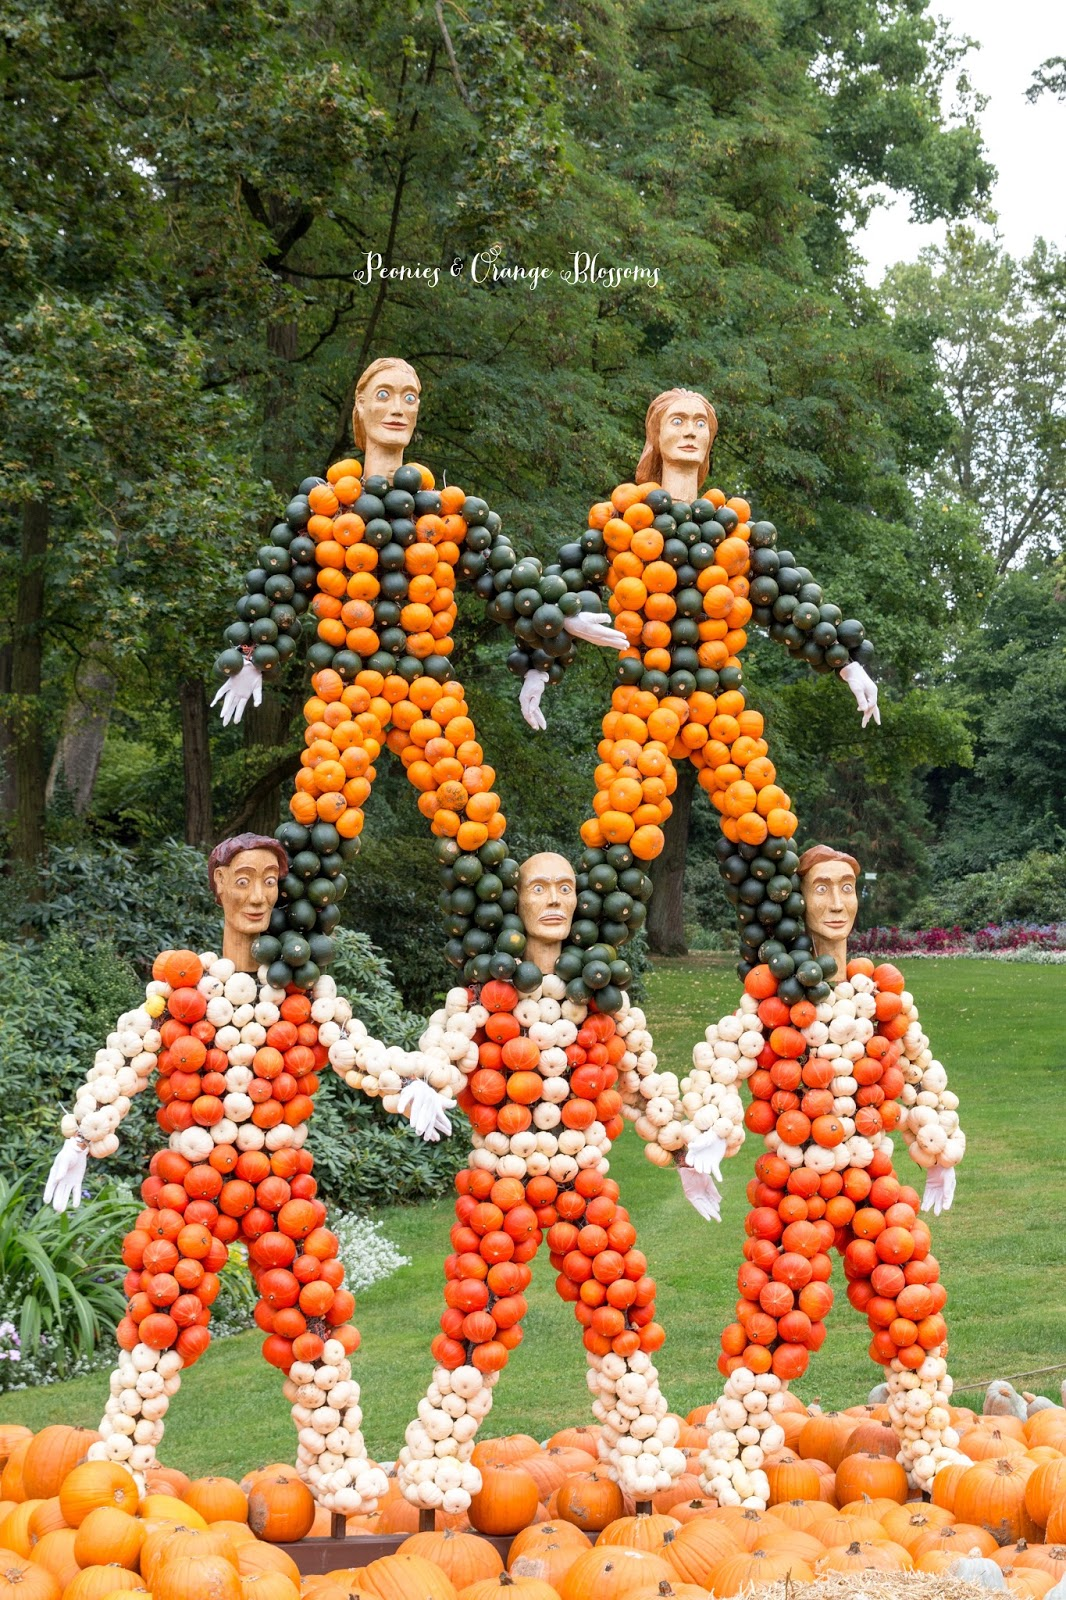 Ludwigsburg Pumpkin Festival 2016 - Kurbisaustellung Ludwigsburg | Peonies & Orange Blossoms